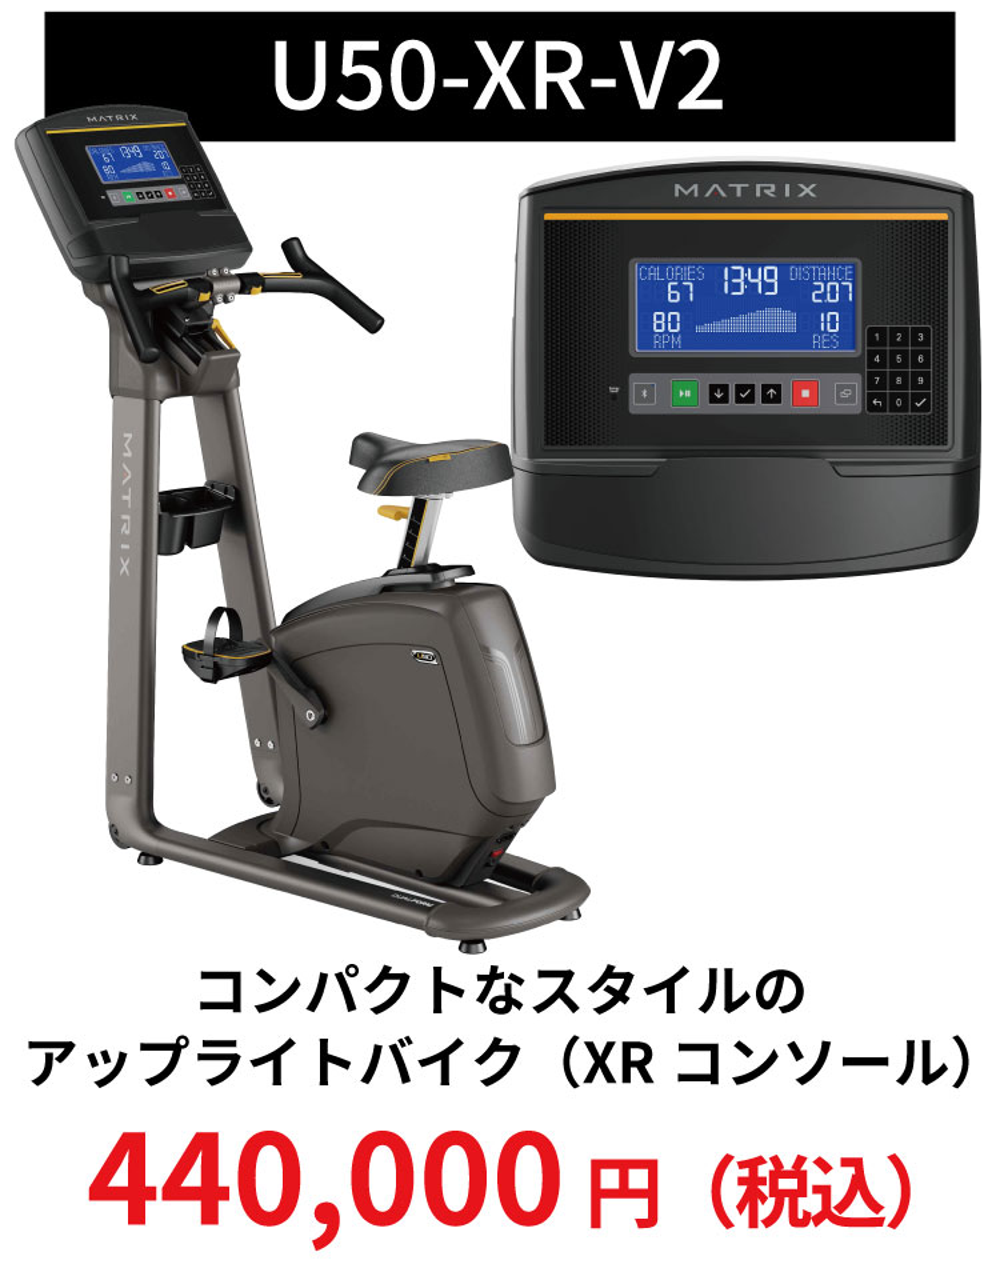 U50-XR